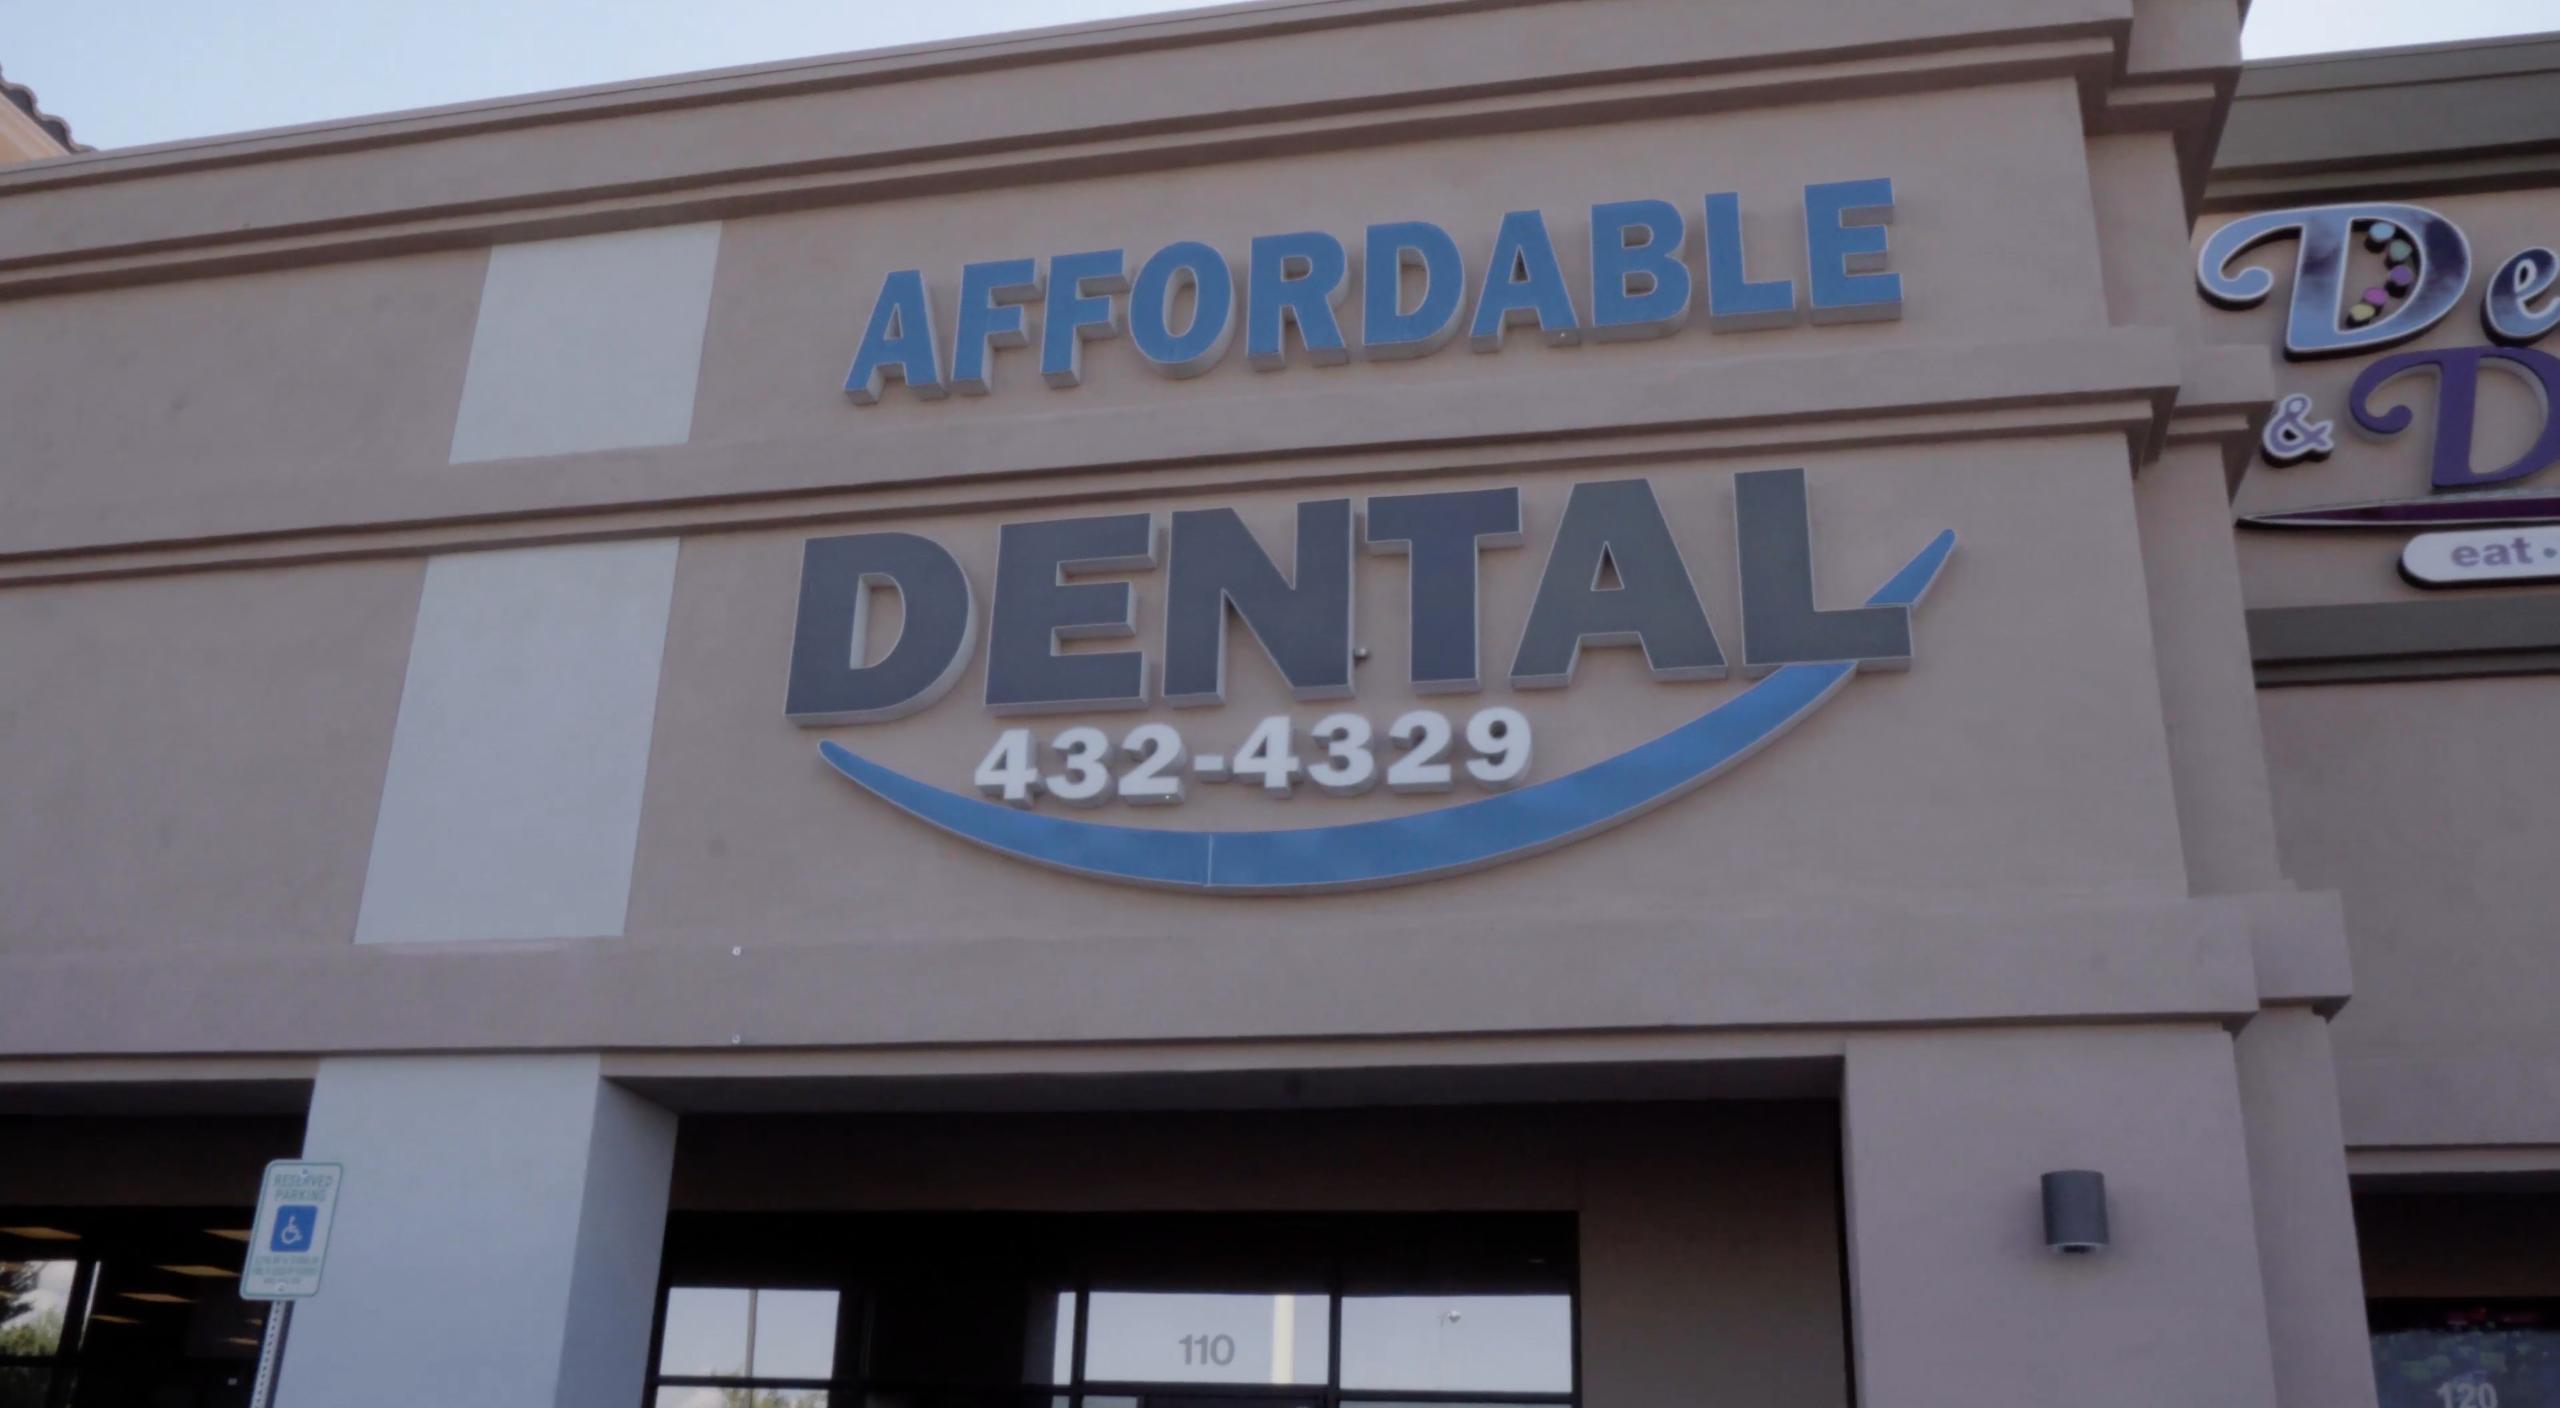 Affordable Dental at Durango & Warmsprings image 0